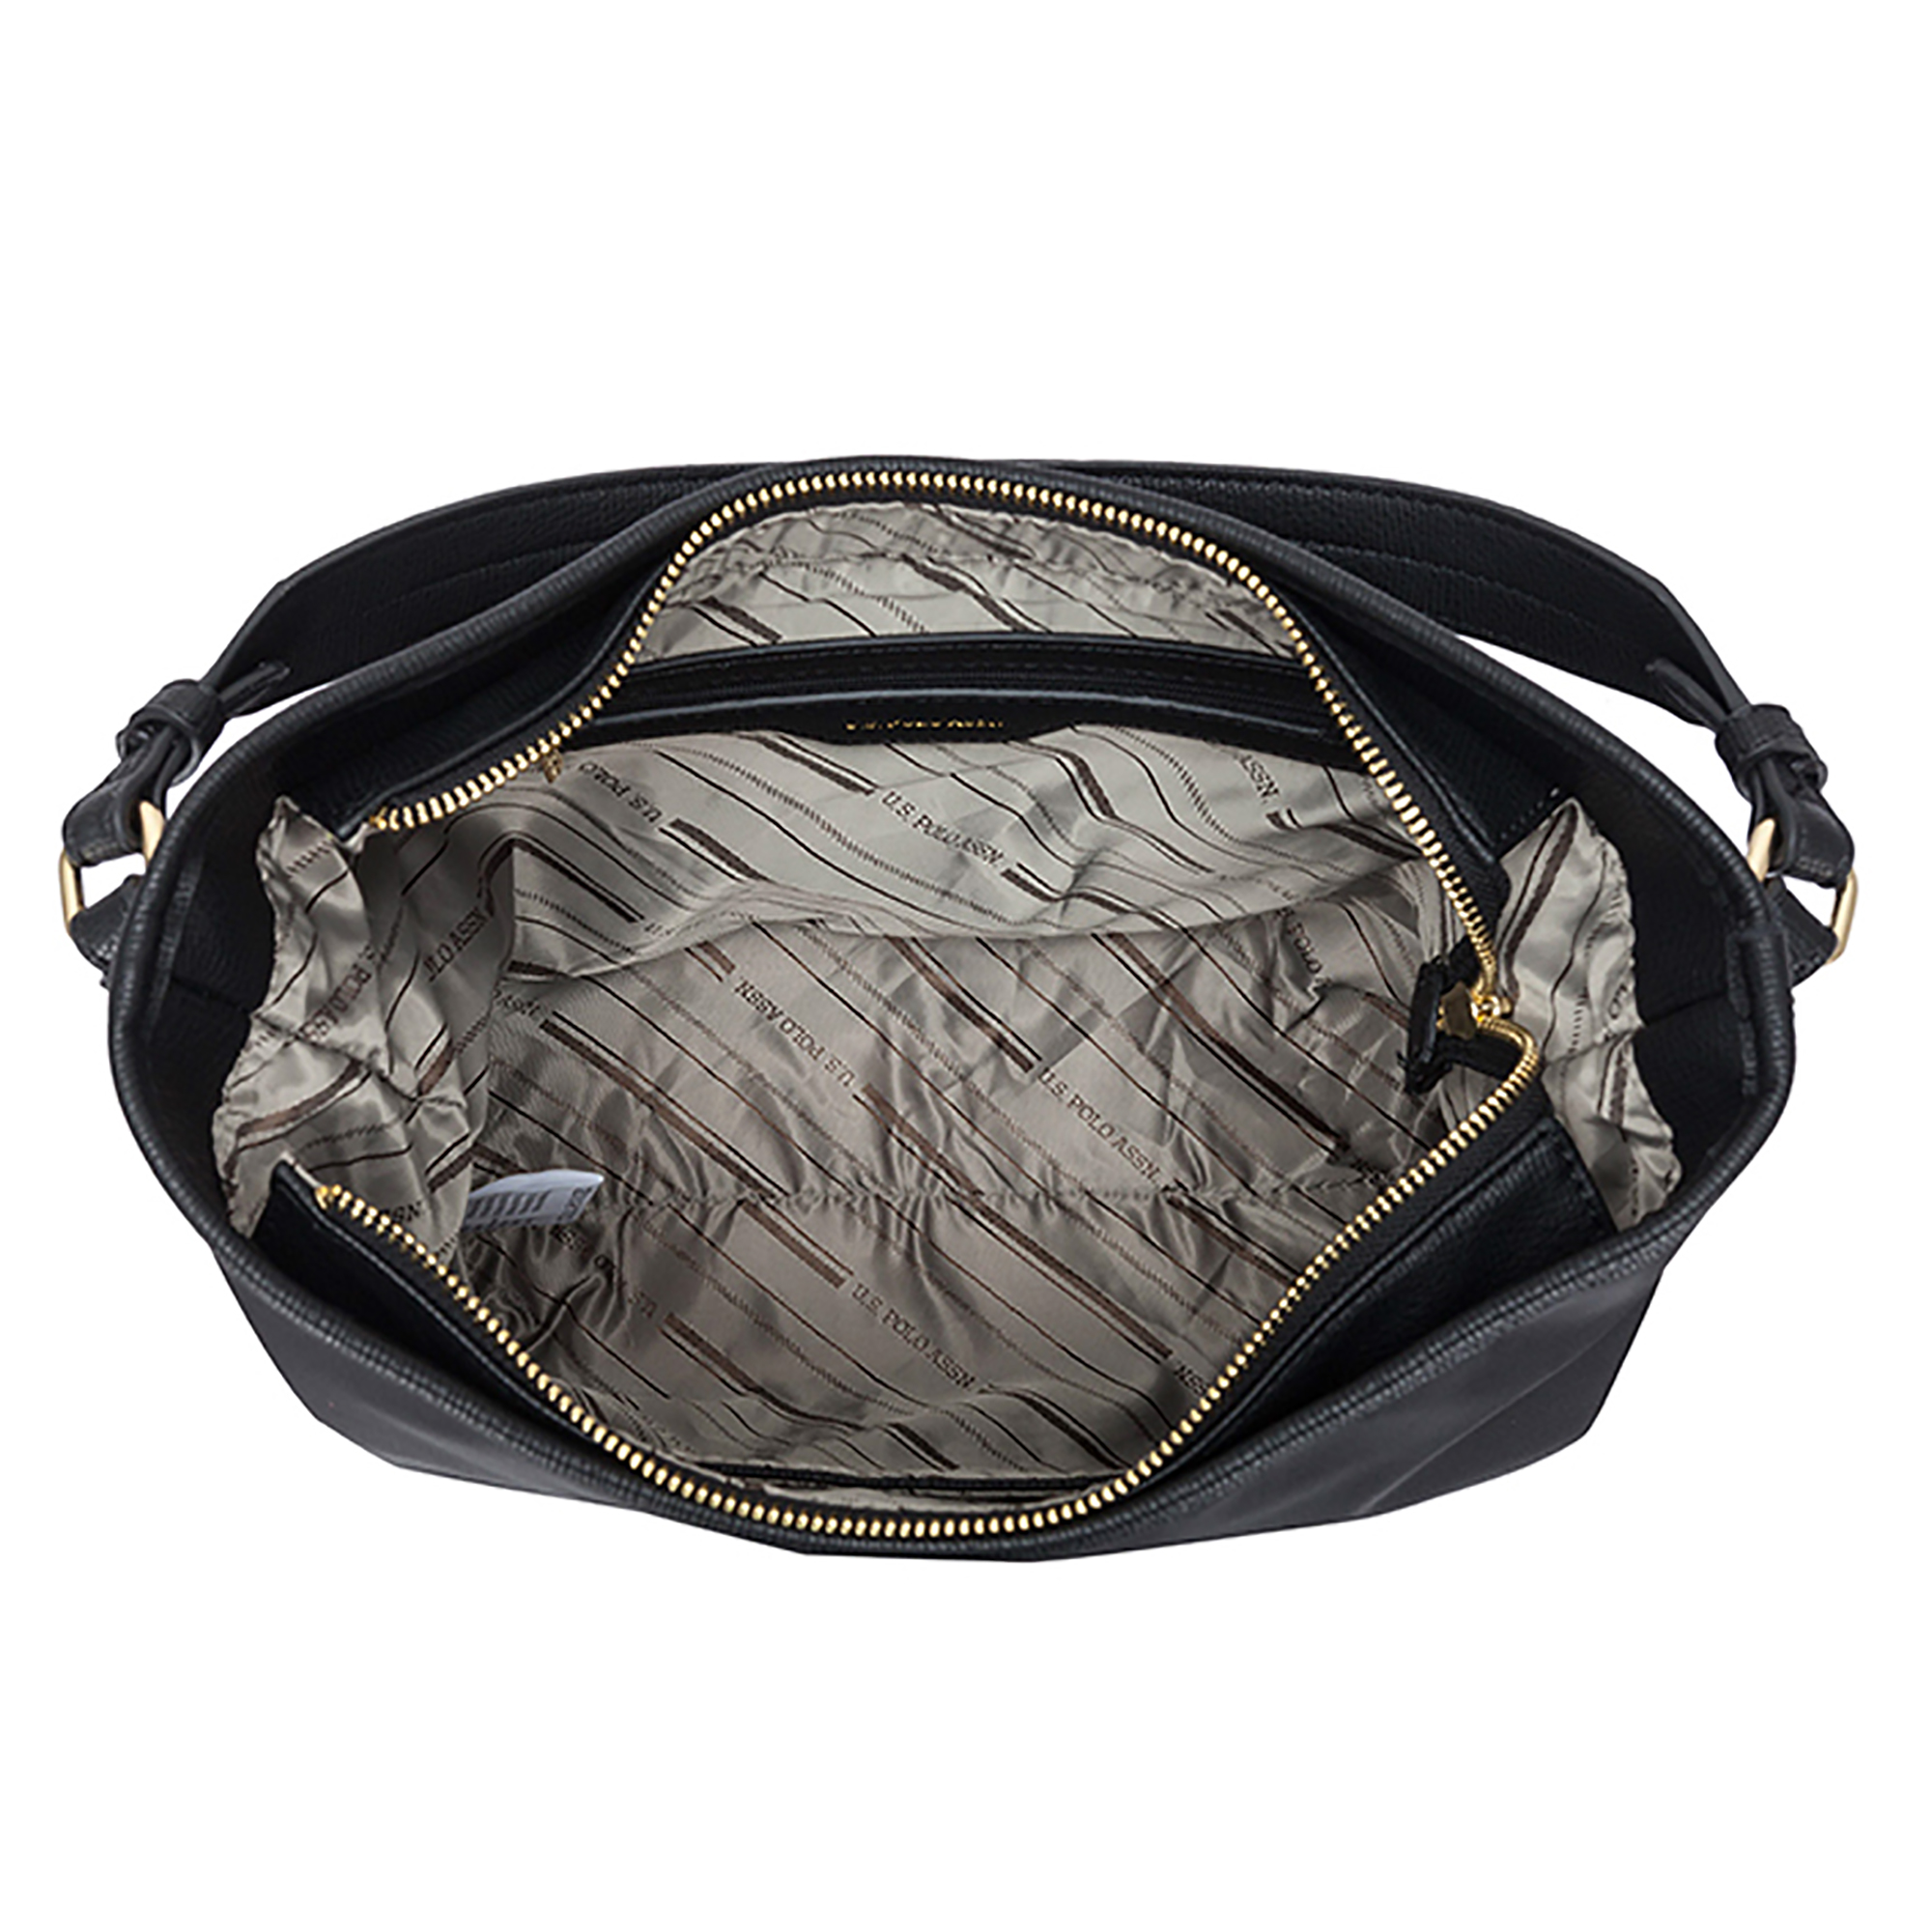 061f0ff287 NEW US Polo Assn. Houston Hobo Zip Top Handbag Casual Fashion Nylon ...